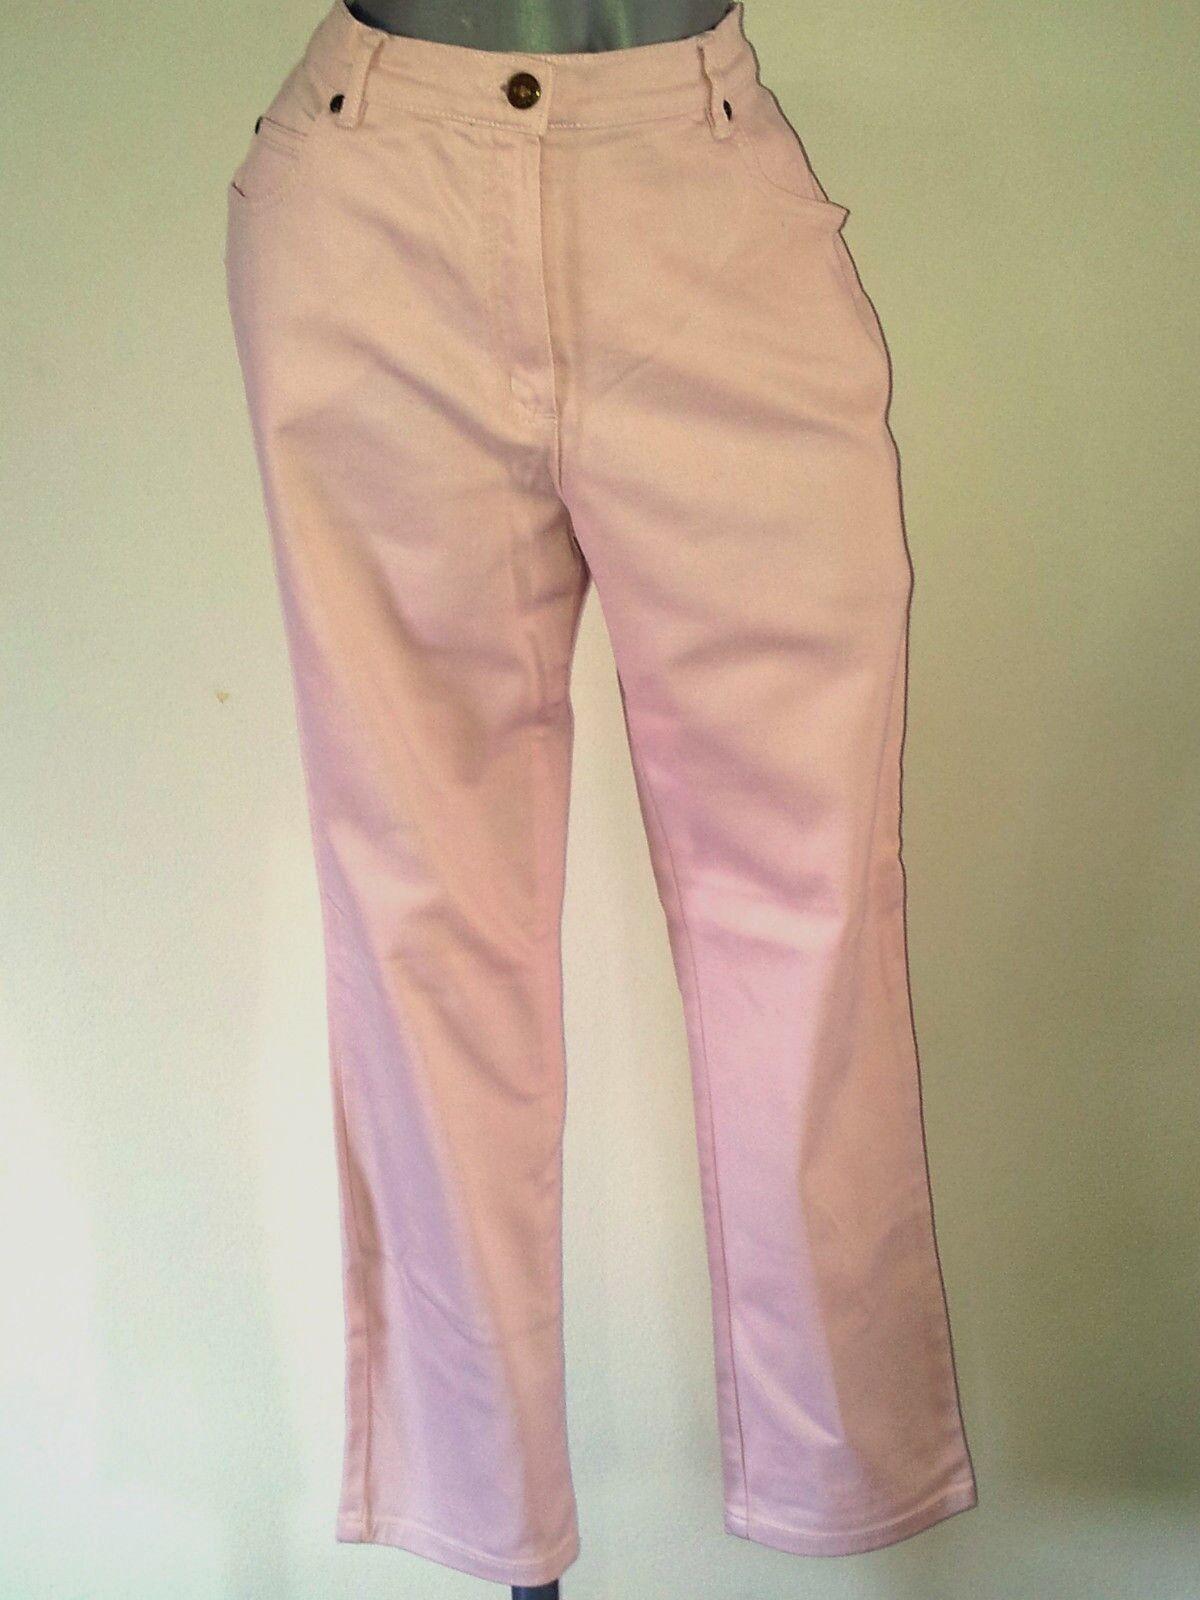 MaxiMe Jeans Hose Rosa Gr. 44 stretch 3 4 lang   .     .   .    .   D